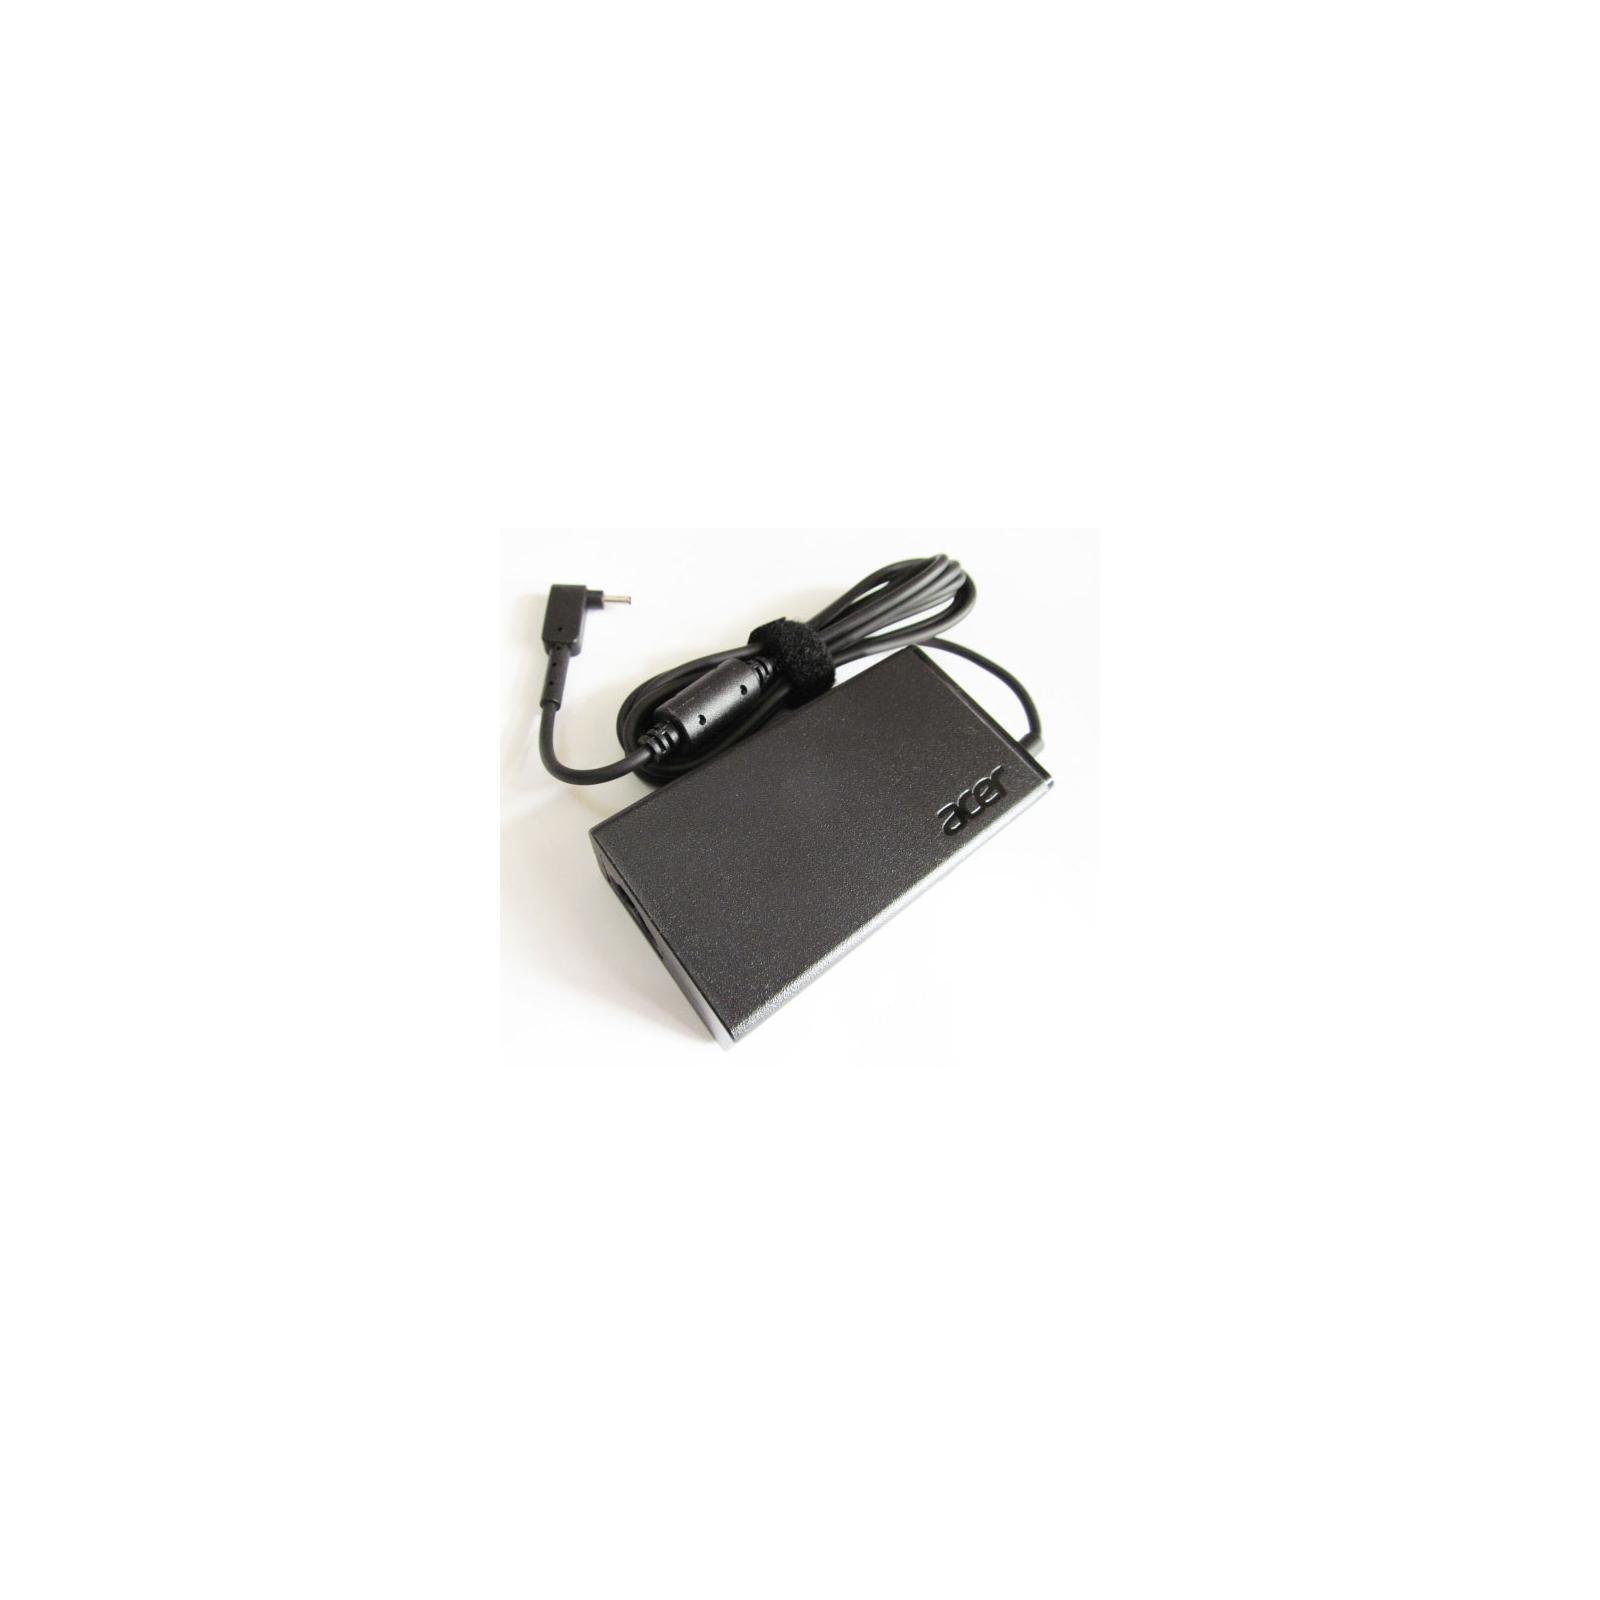 Блок питания к ноутбуку Acer 65W 19V, 3.42A, разъем 3.0/1.1 (A11-065N1A / A40266) изображение 2